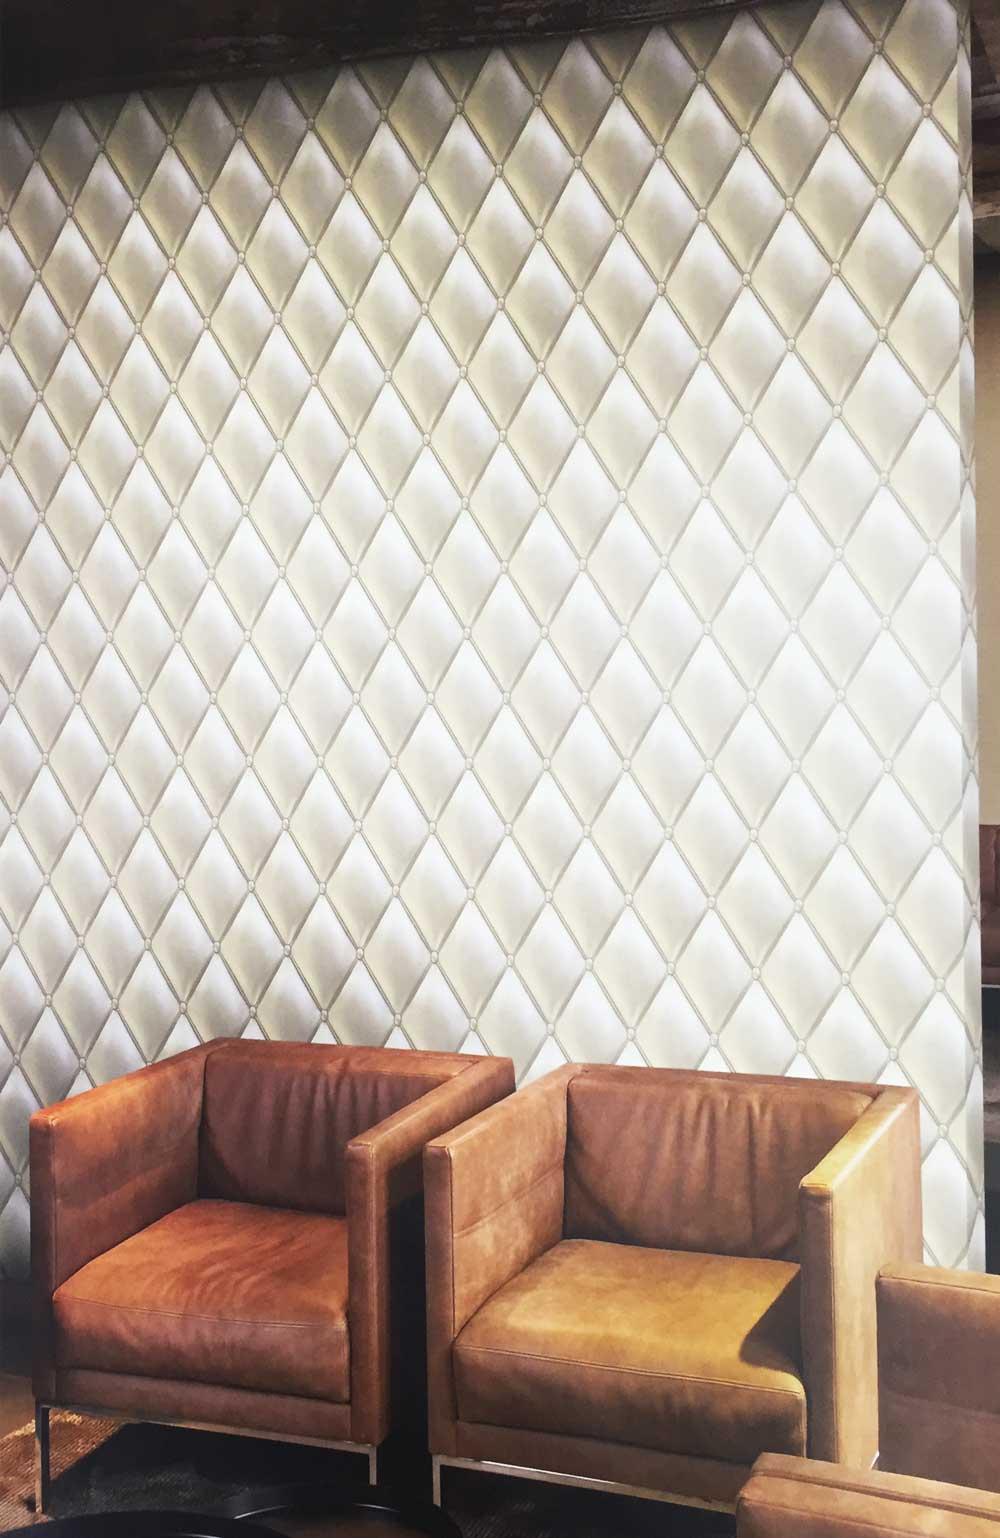 Deco4walls exposed soft diamond wallpaper takyin - Commercial wallpaper pasting machine ...